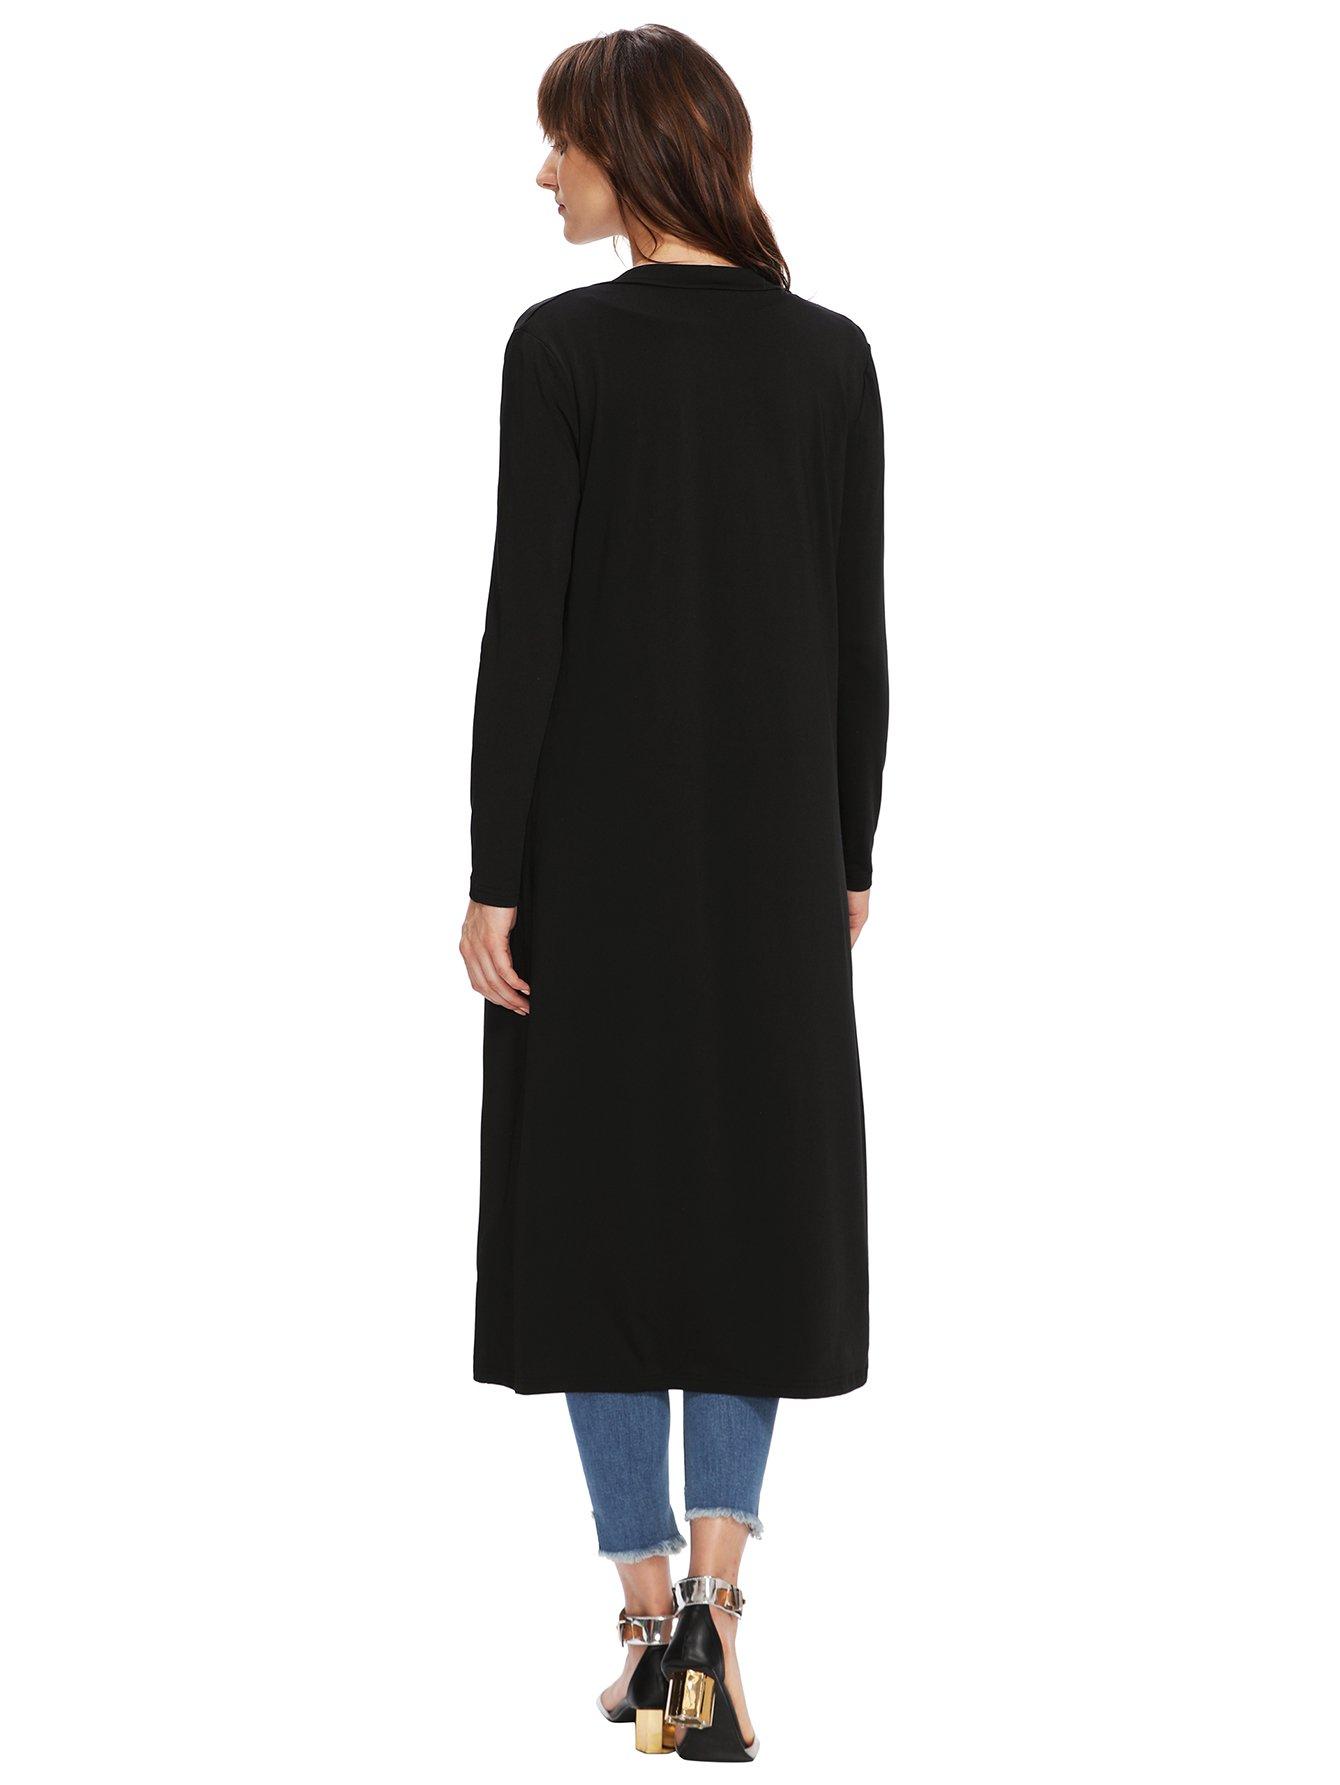 Verdusa Women's Long Sleeve Open Front Long Maxi Cardigan Longline Duster Coat Black M by Verdusa (Image #4)